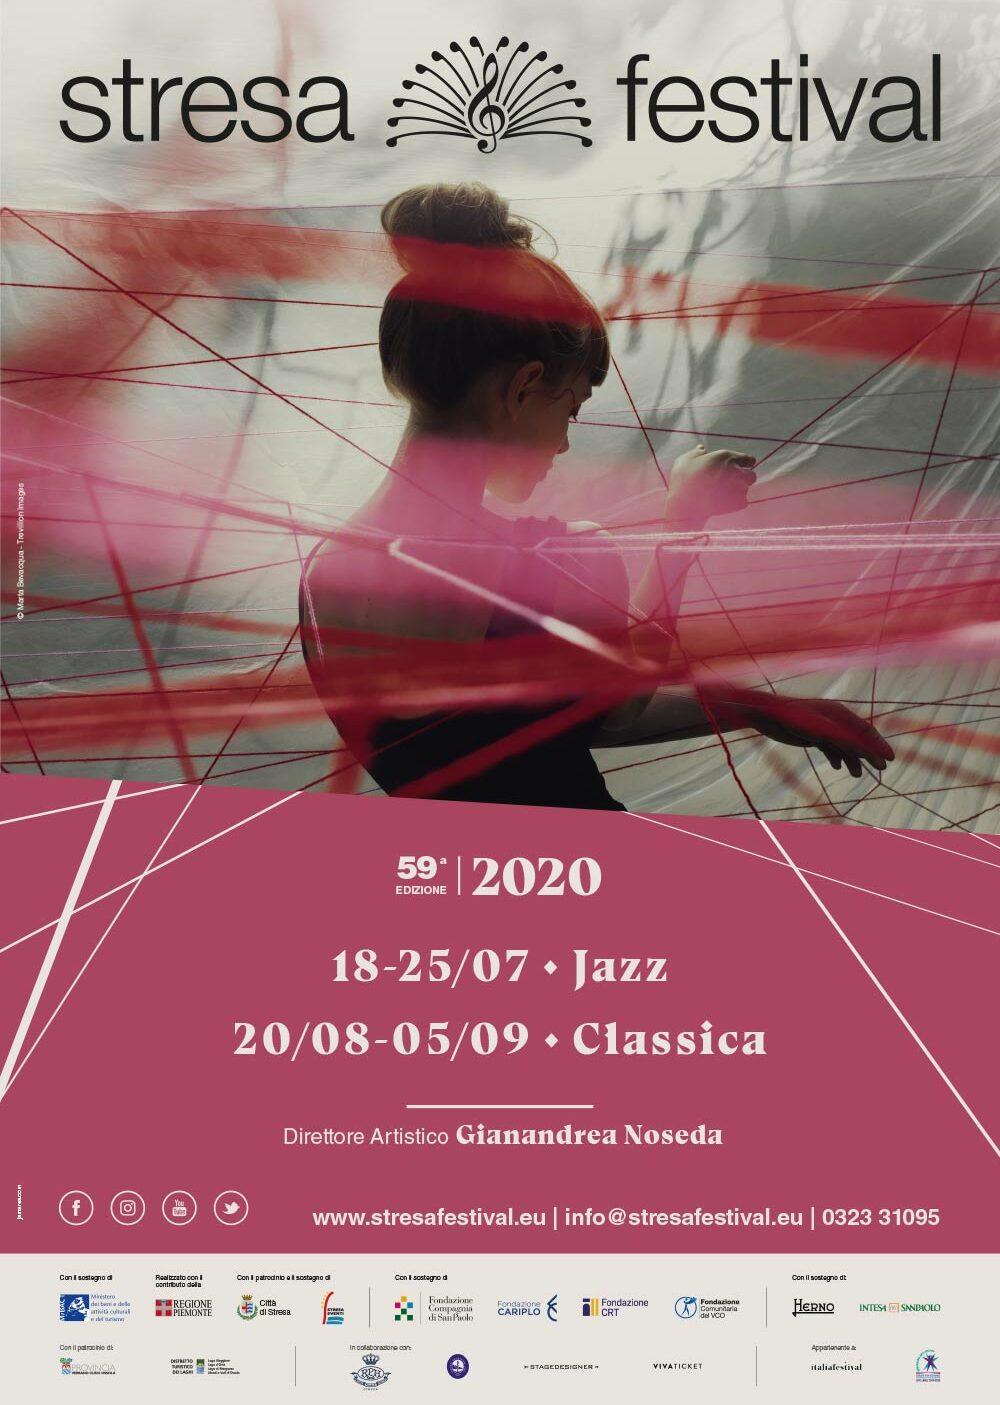 Stresa-Festival-locandina-2020